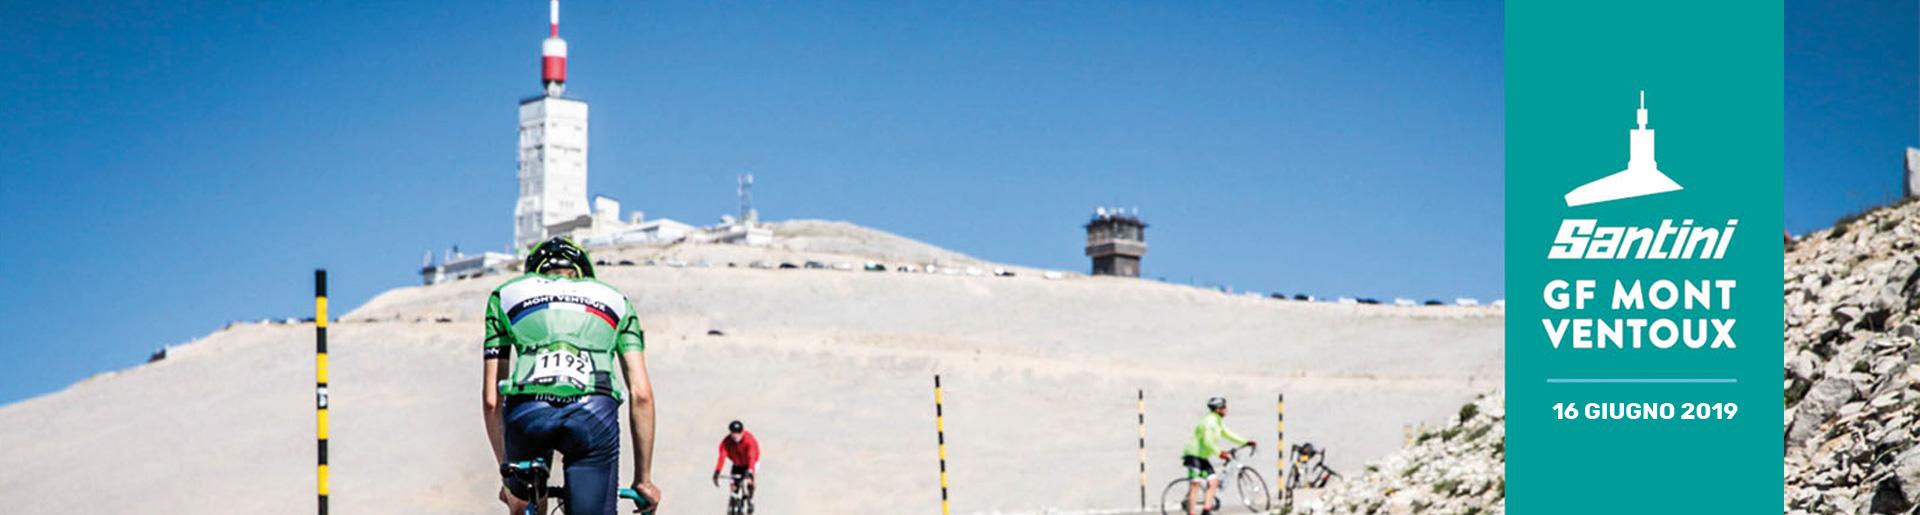 Ciclismo 2020 Calendario.Santini Gf Mount Ventoux